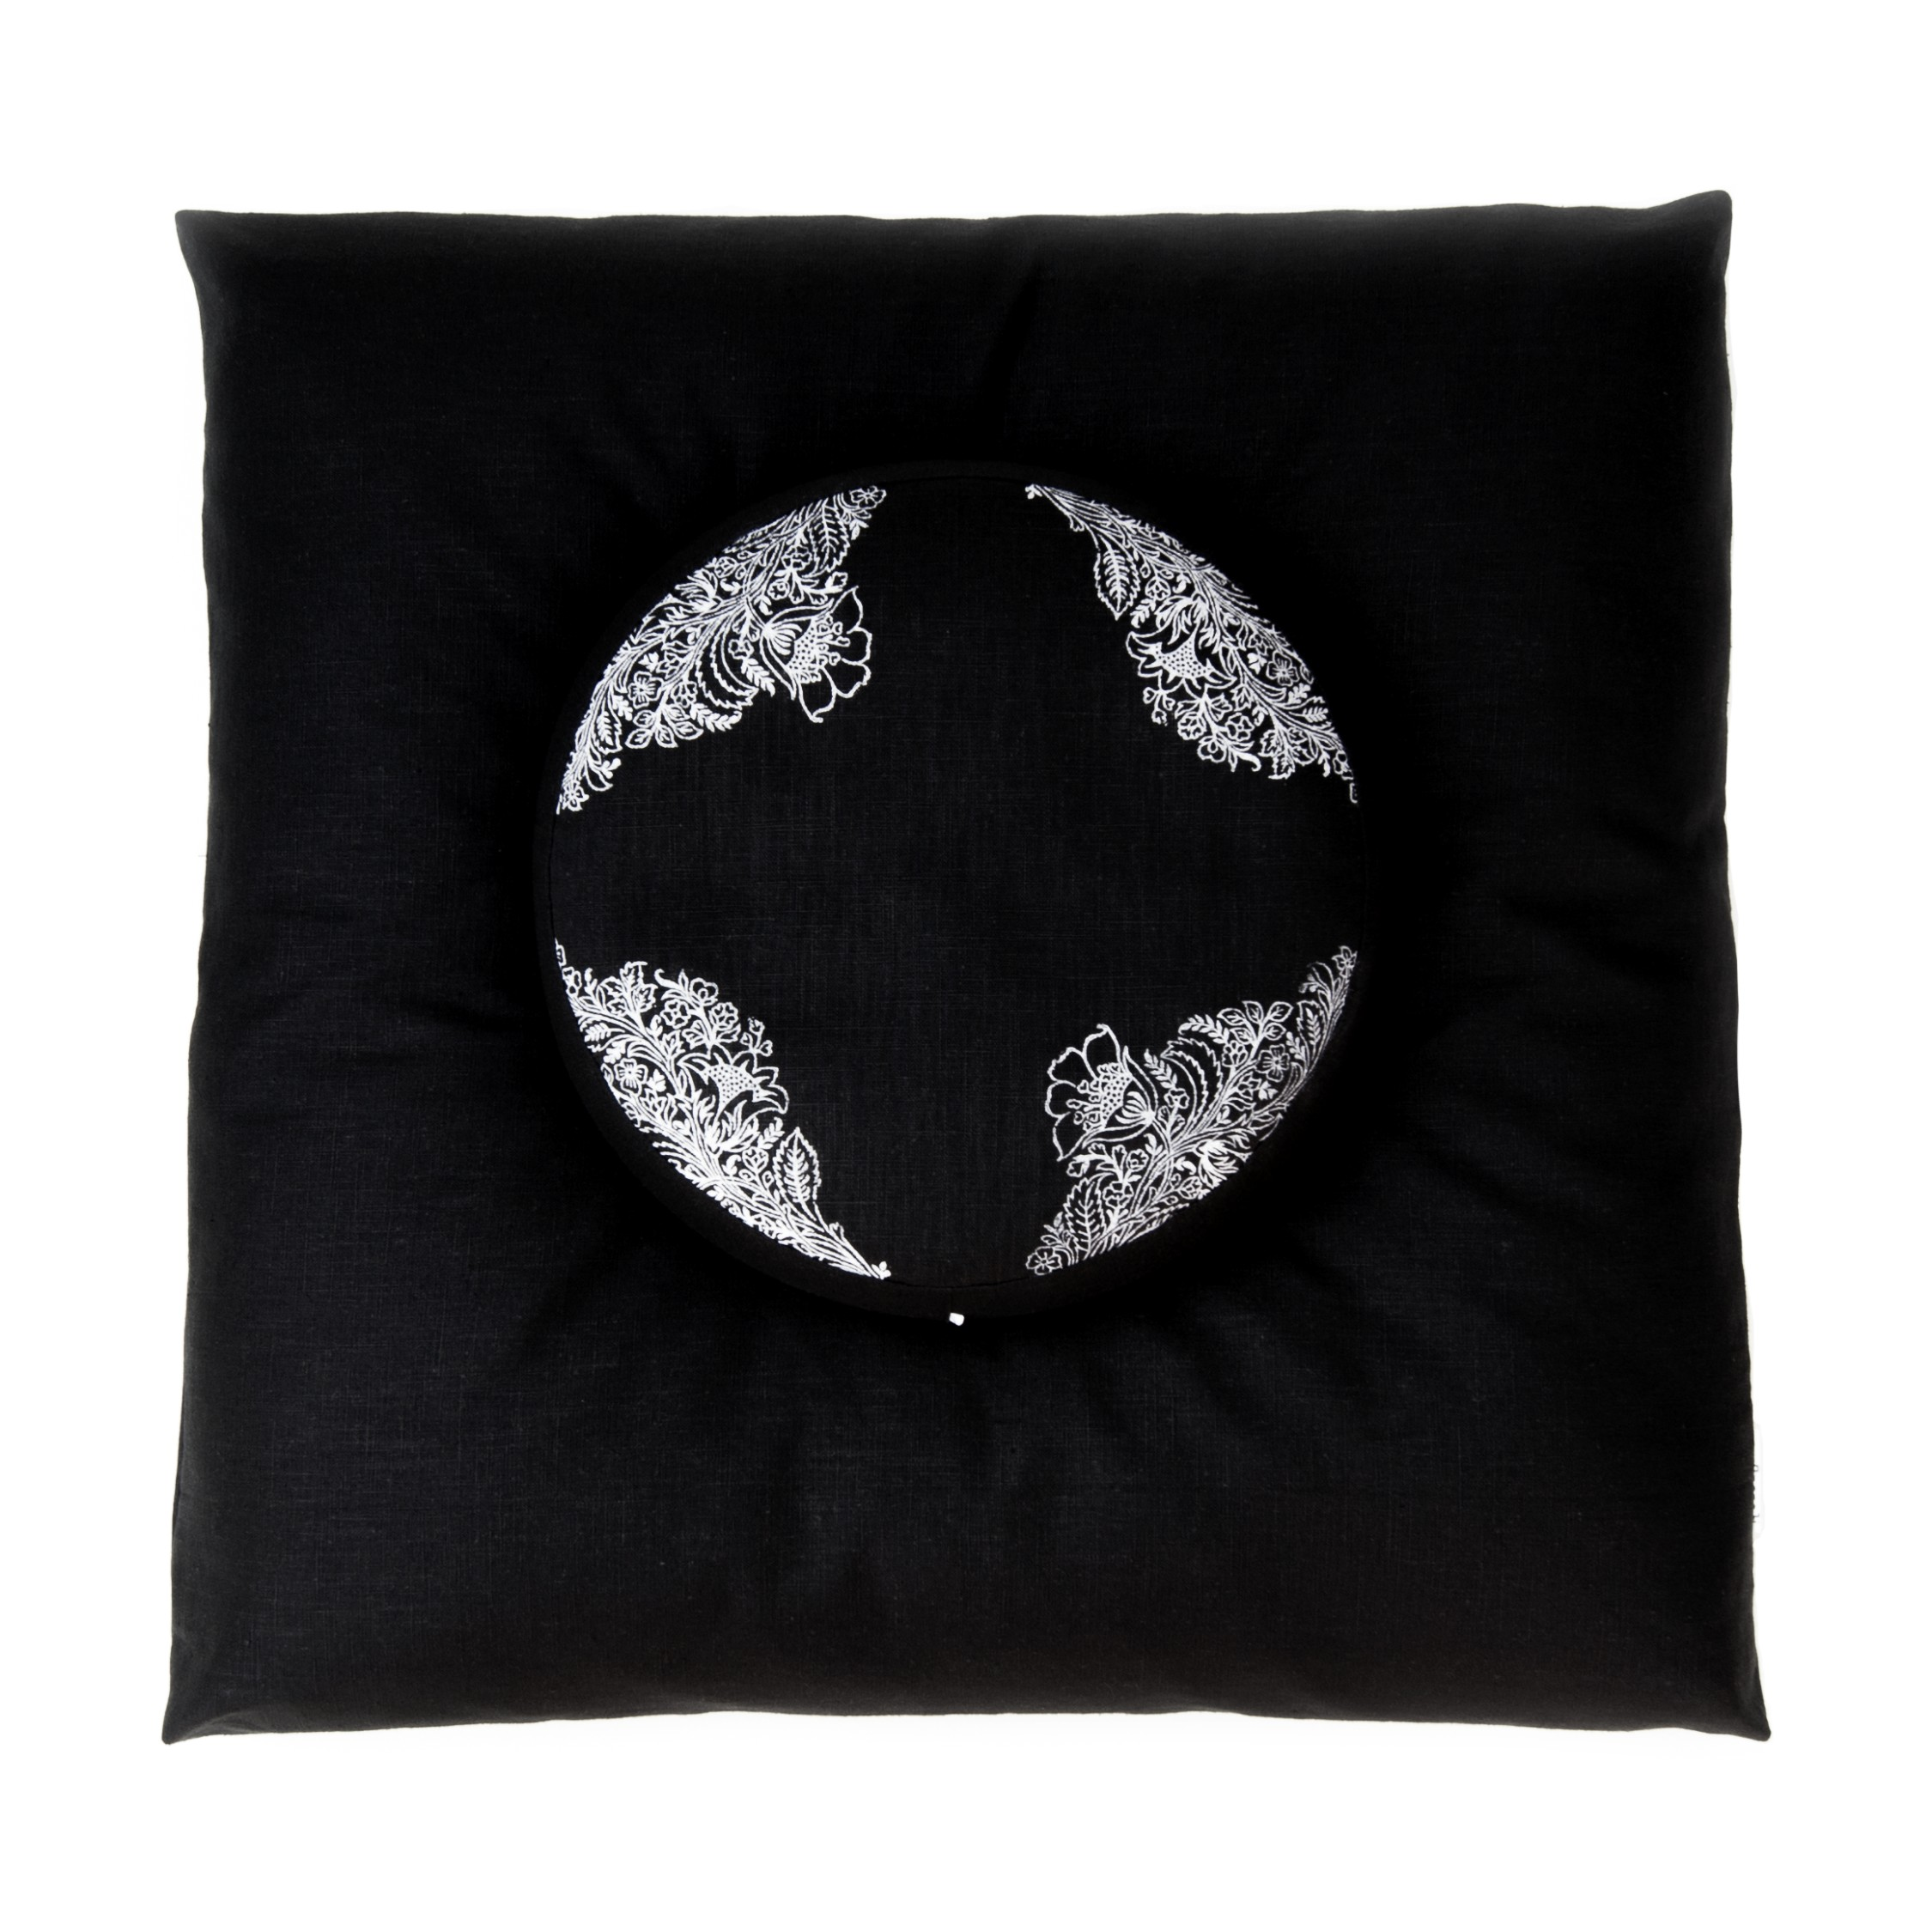 Meditation set in non-toxic flax linen